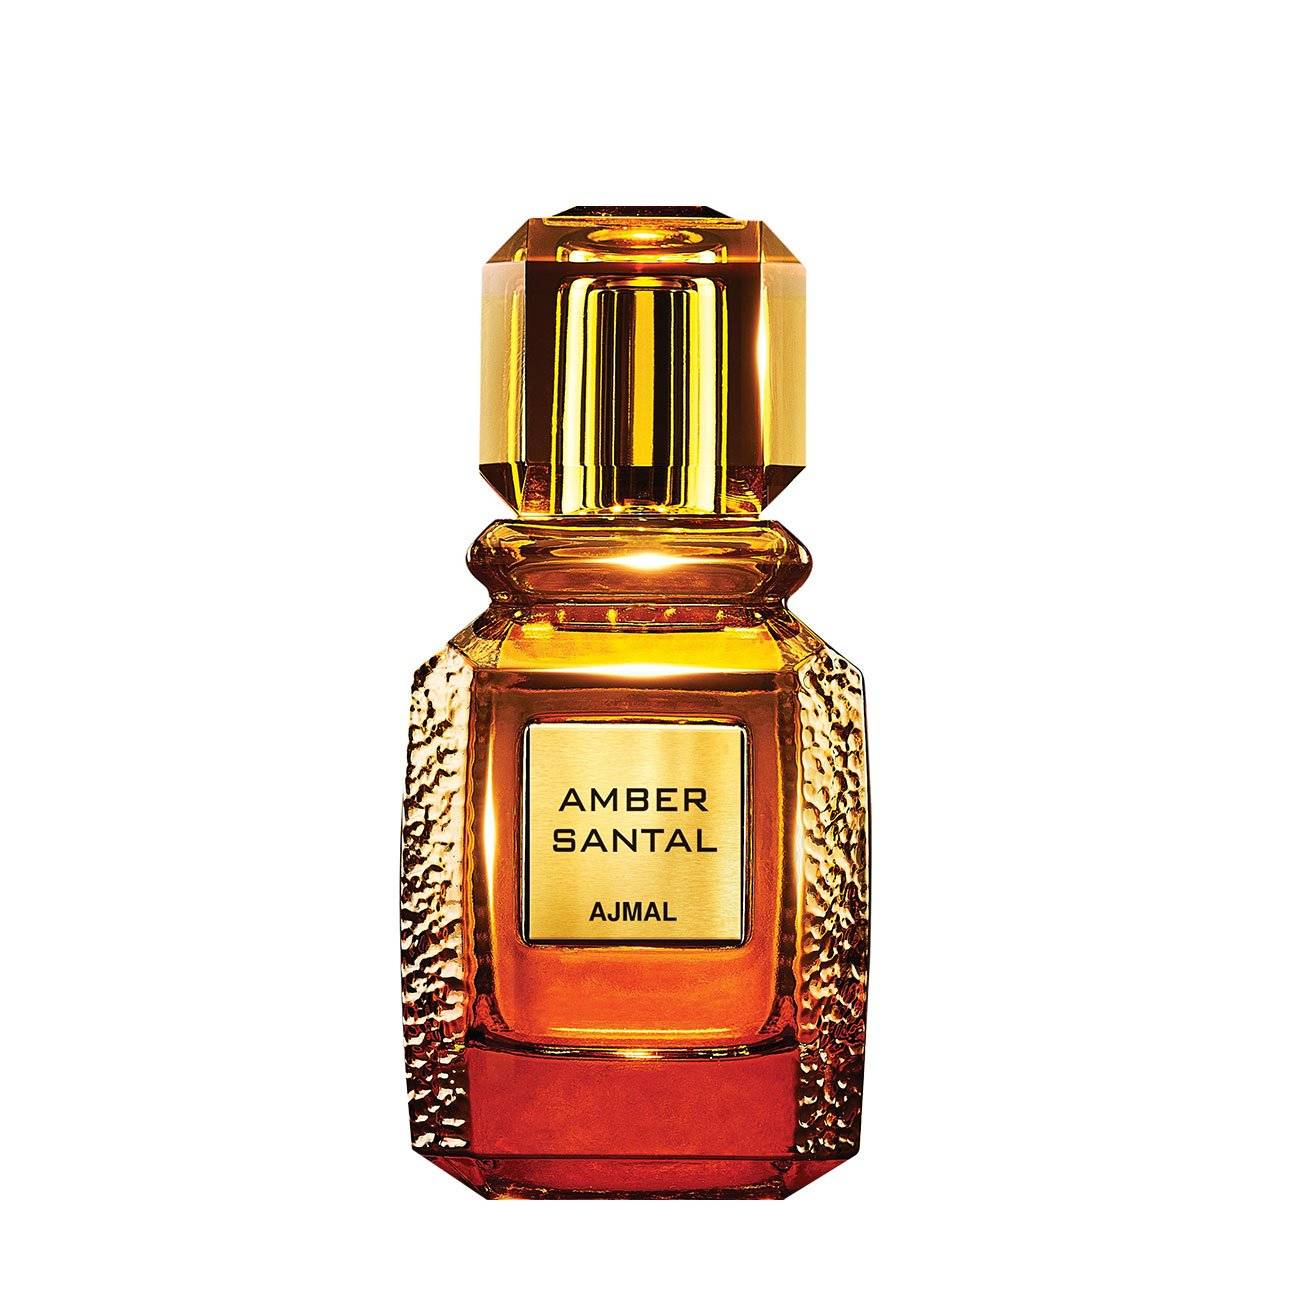 Amber Santal 100ml